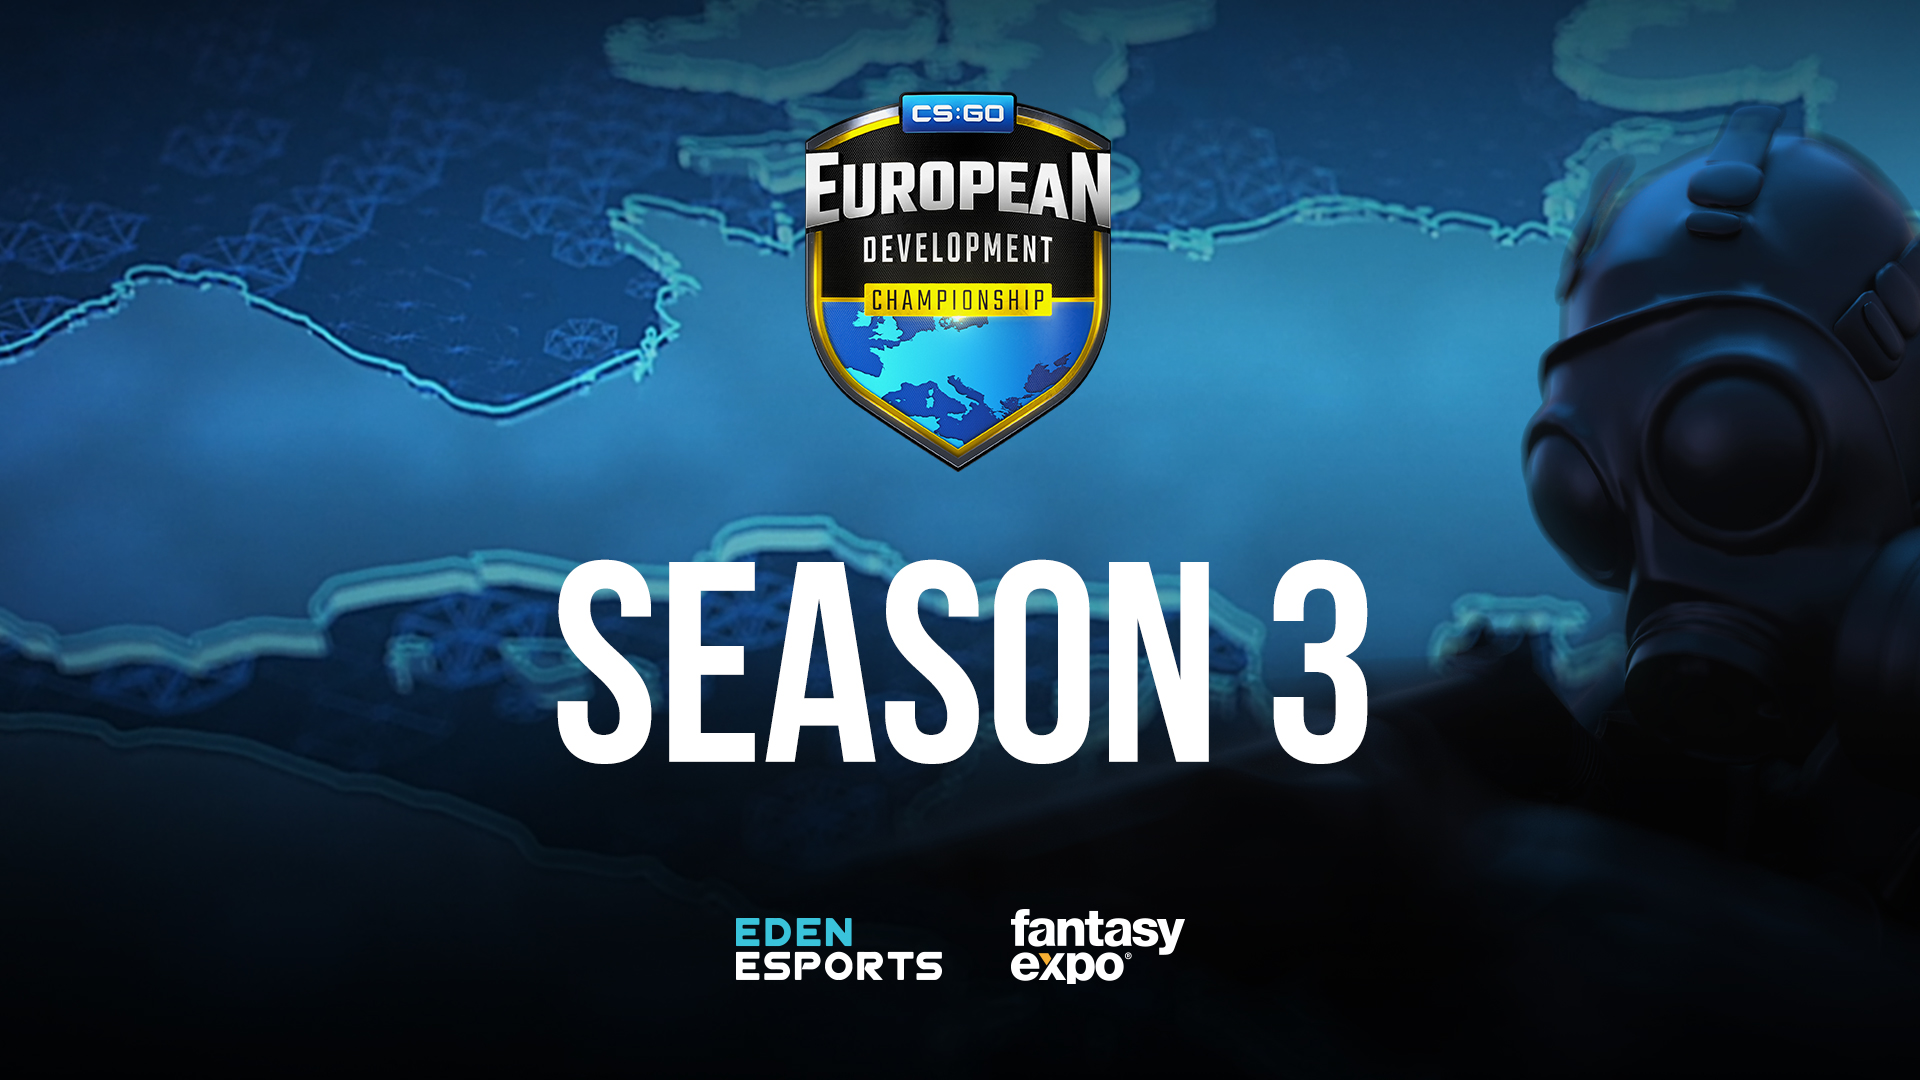 Trzeci sezon rozgrywek European Development Championship